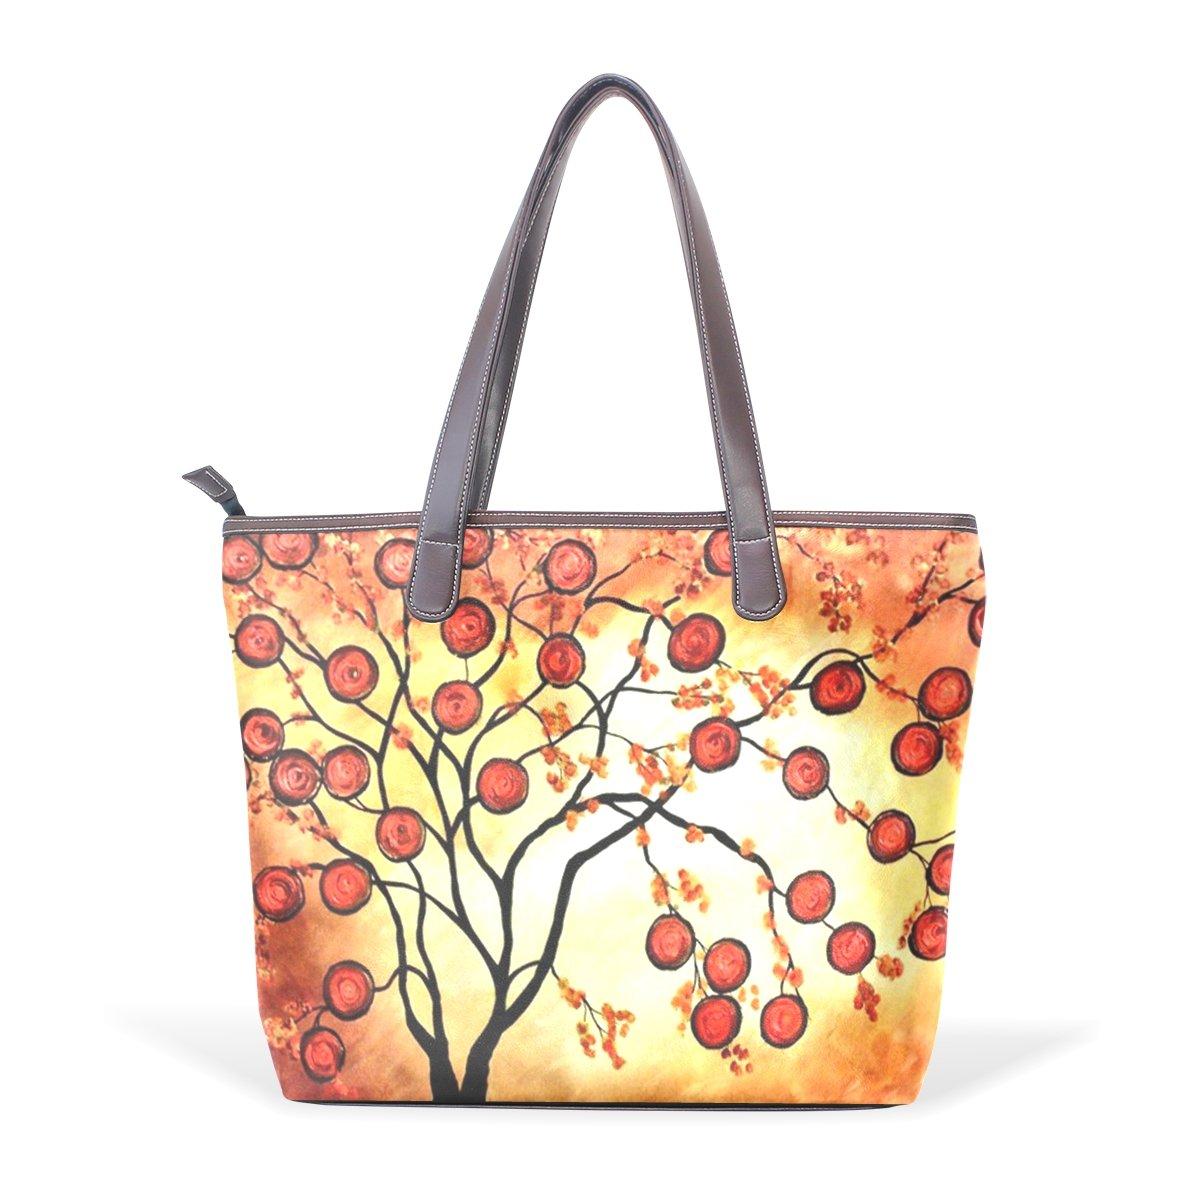 Ye Store Fruit Mature Season Lady PU Leather Handbag Tote Bag Shoulder Bag Shopping Bag